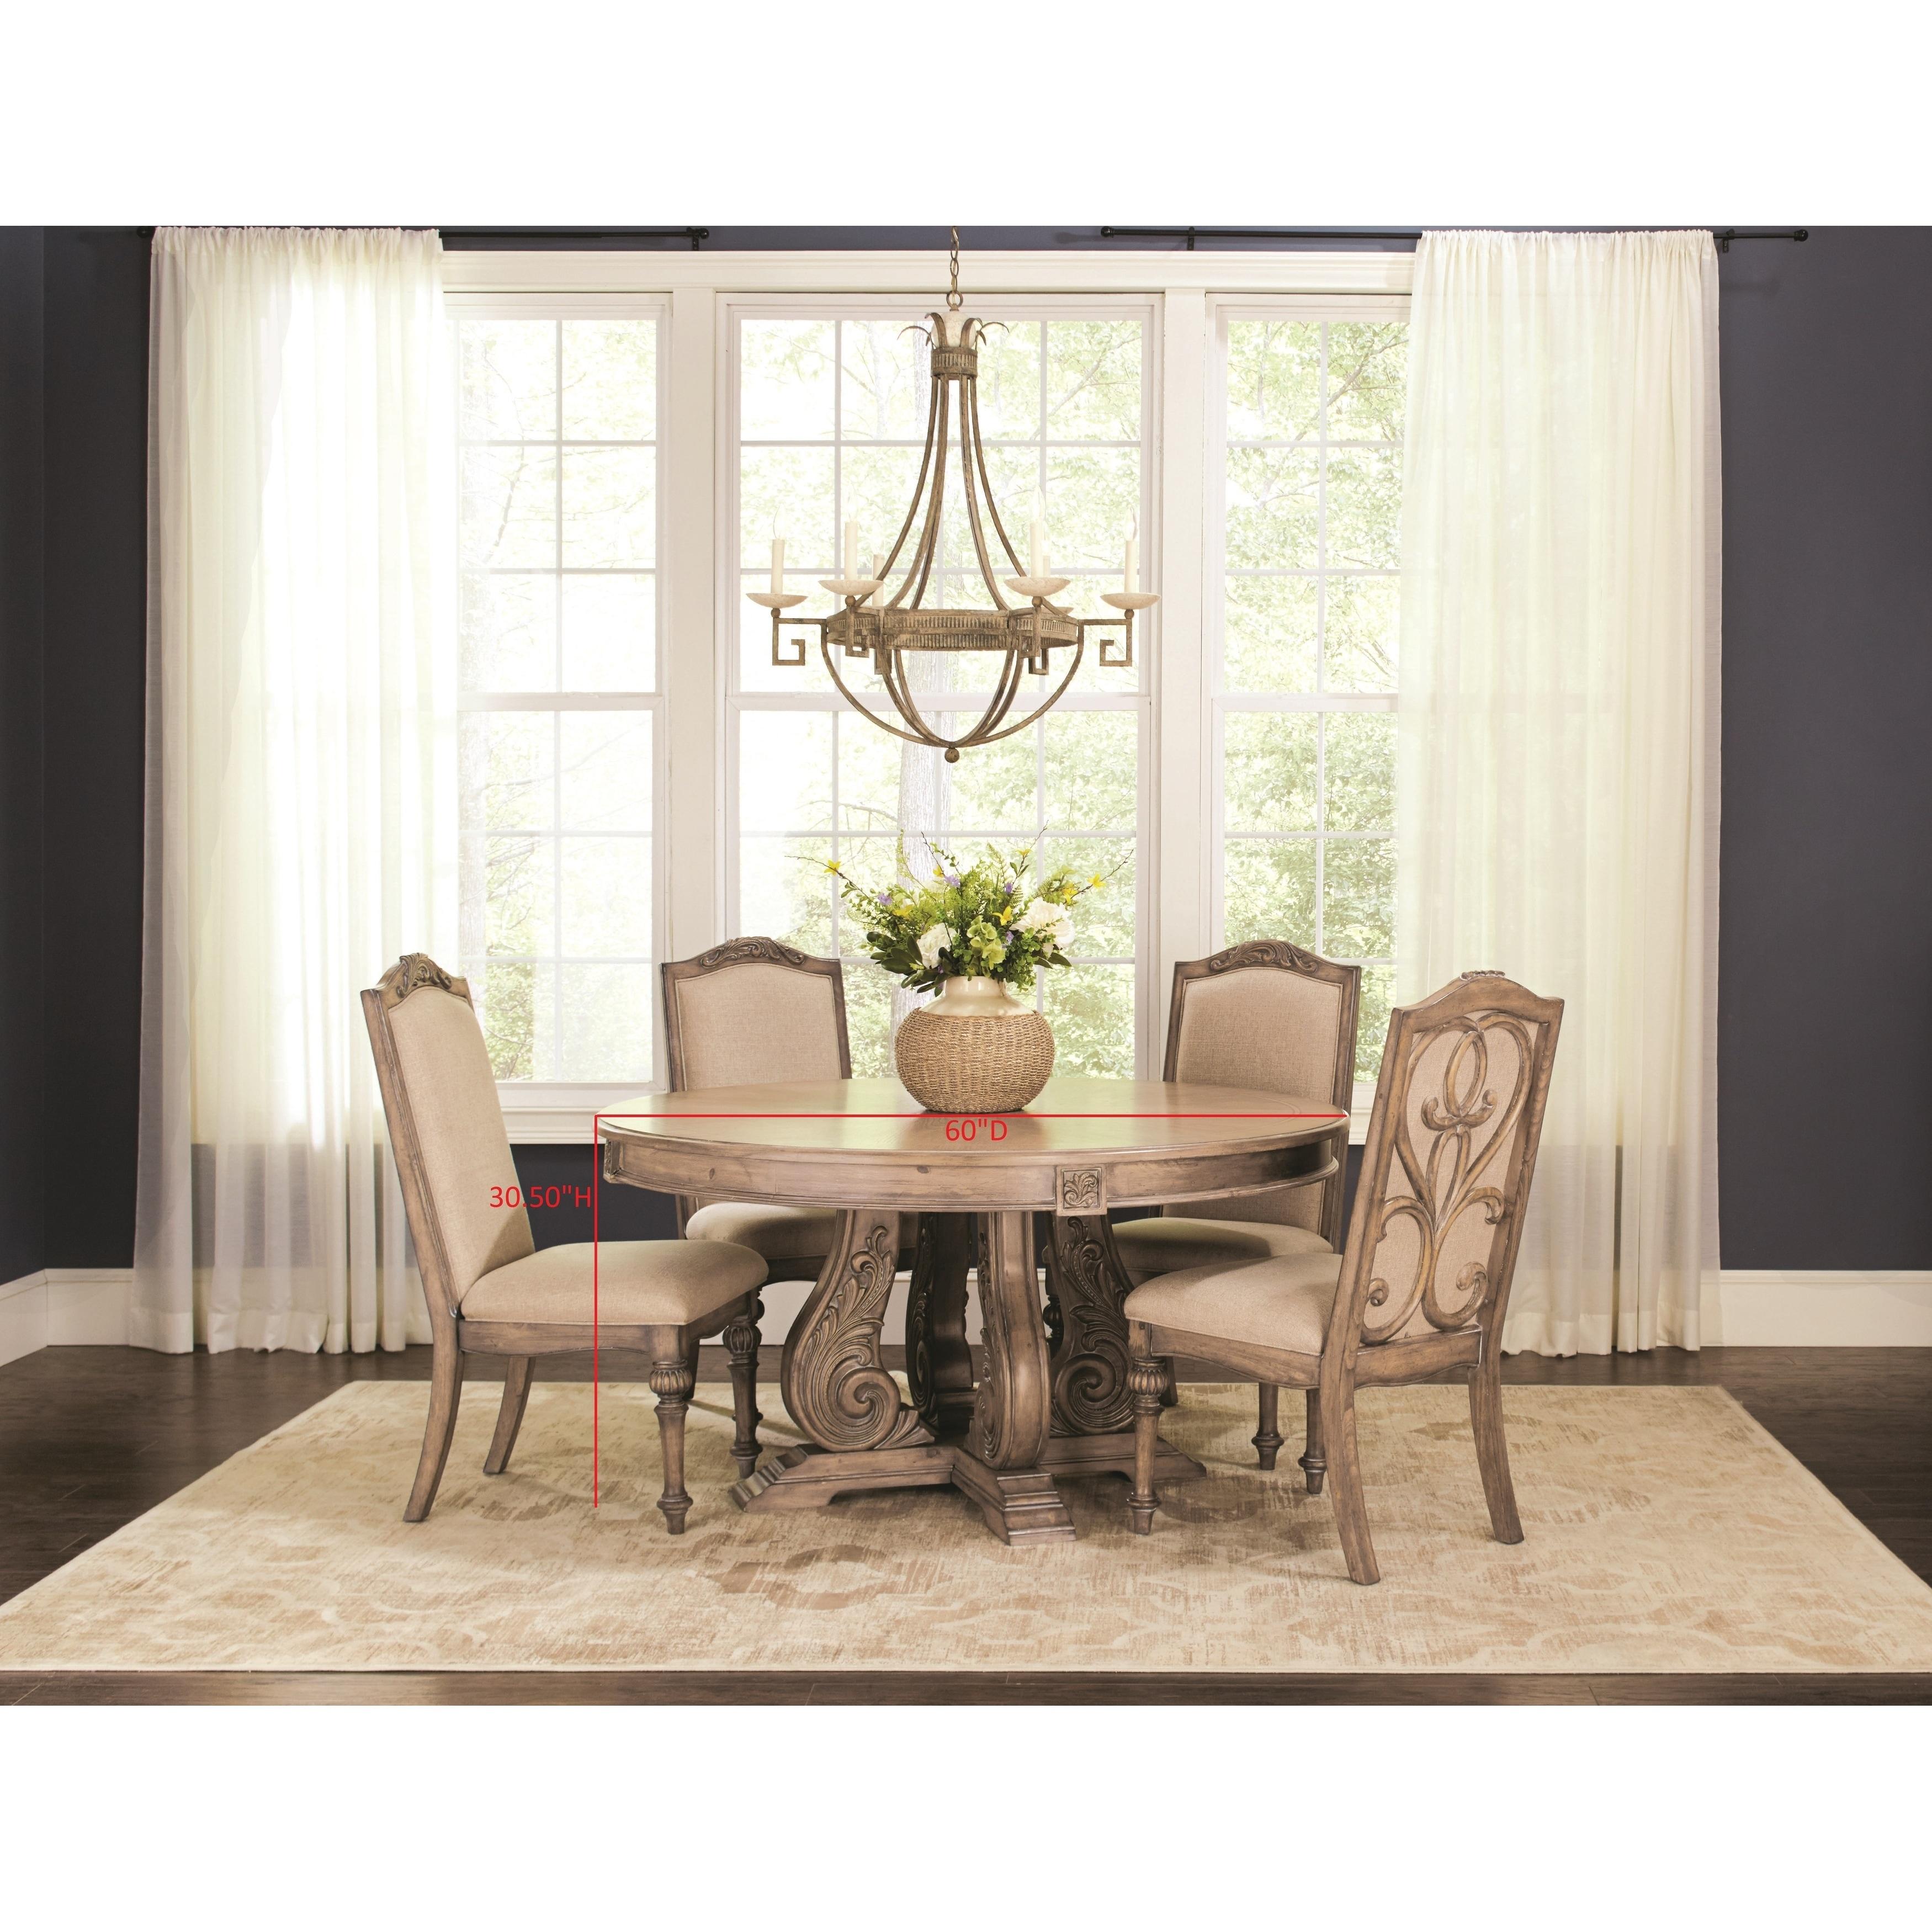 Ilana Traditional 5-piece Round Formal Dining Set